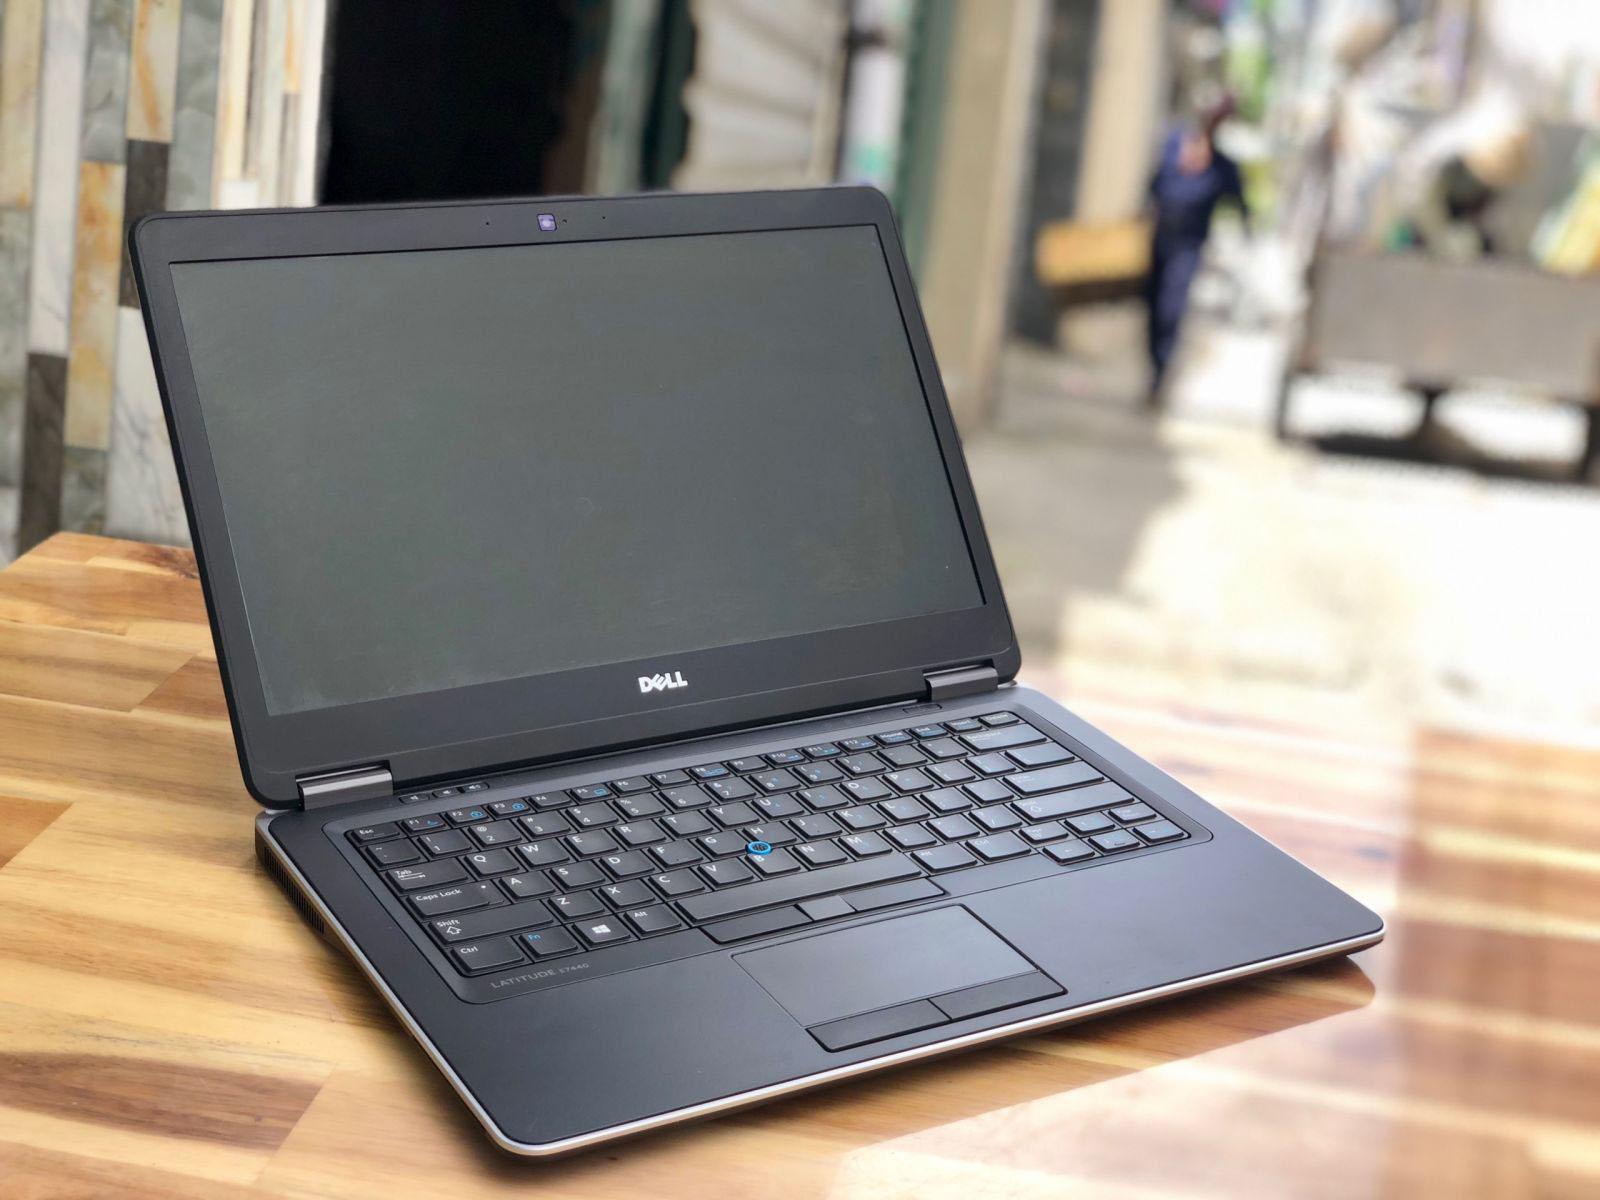 Dell Latitude E7440 (Core i5 4300U, 1.90 GHz Tubor Boost 2.5GHz , Ram 8GB, SSD 120GB, Màn Hình 14 inch)